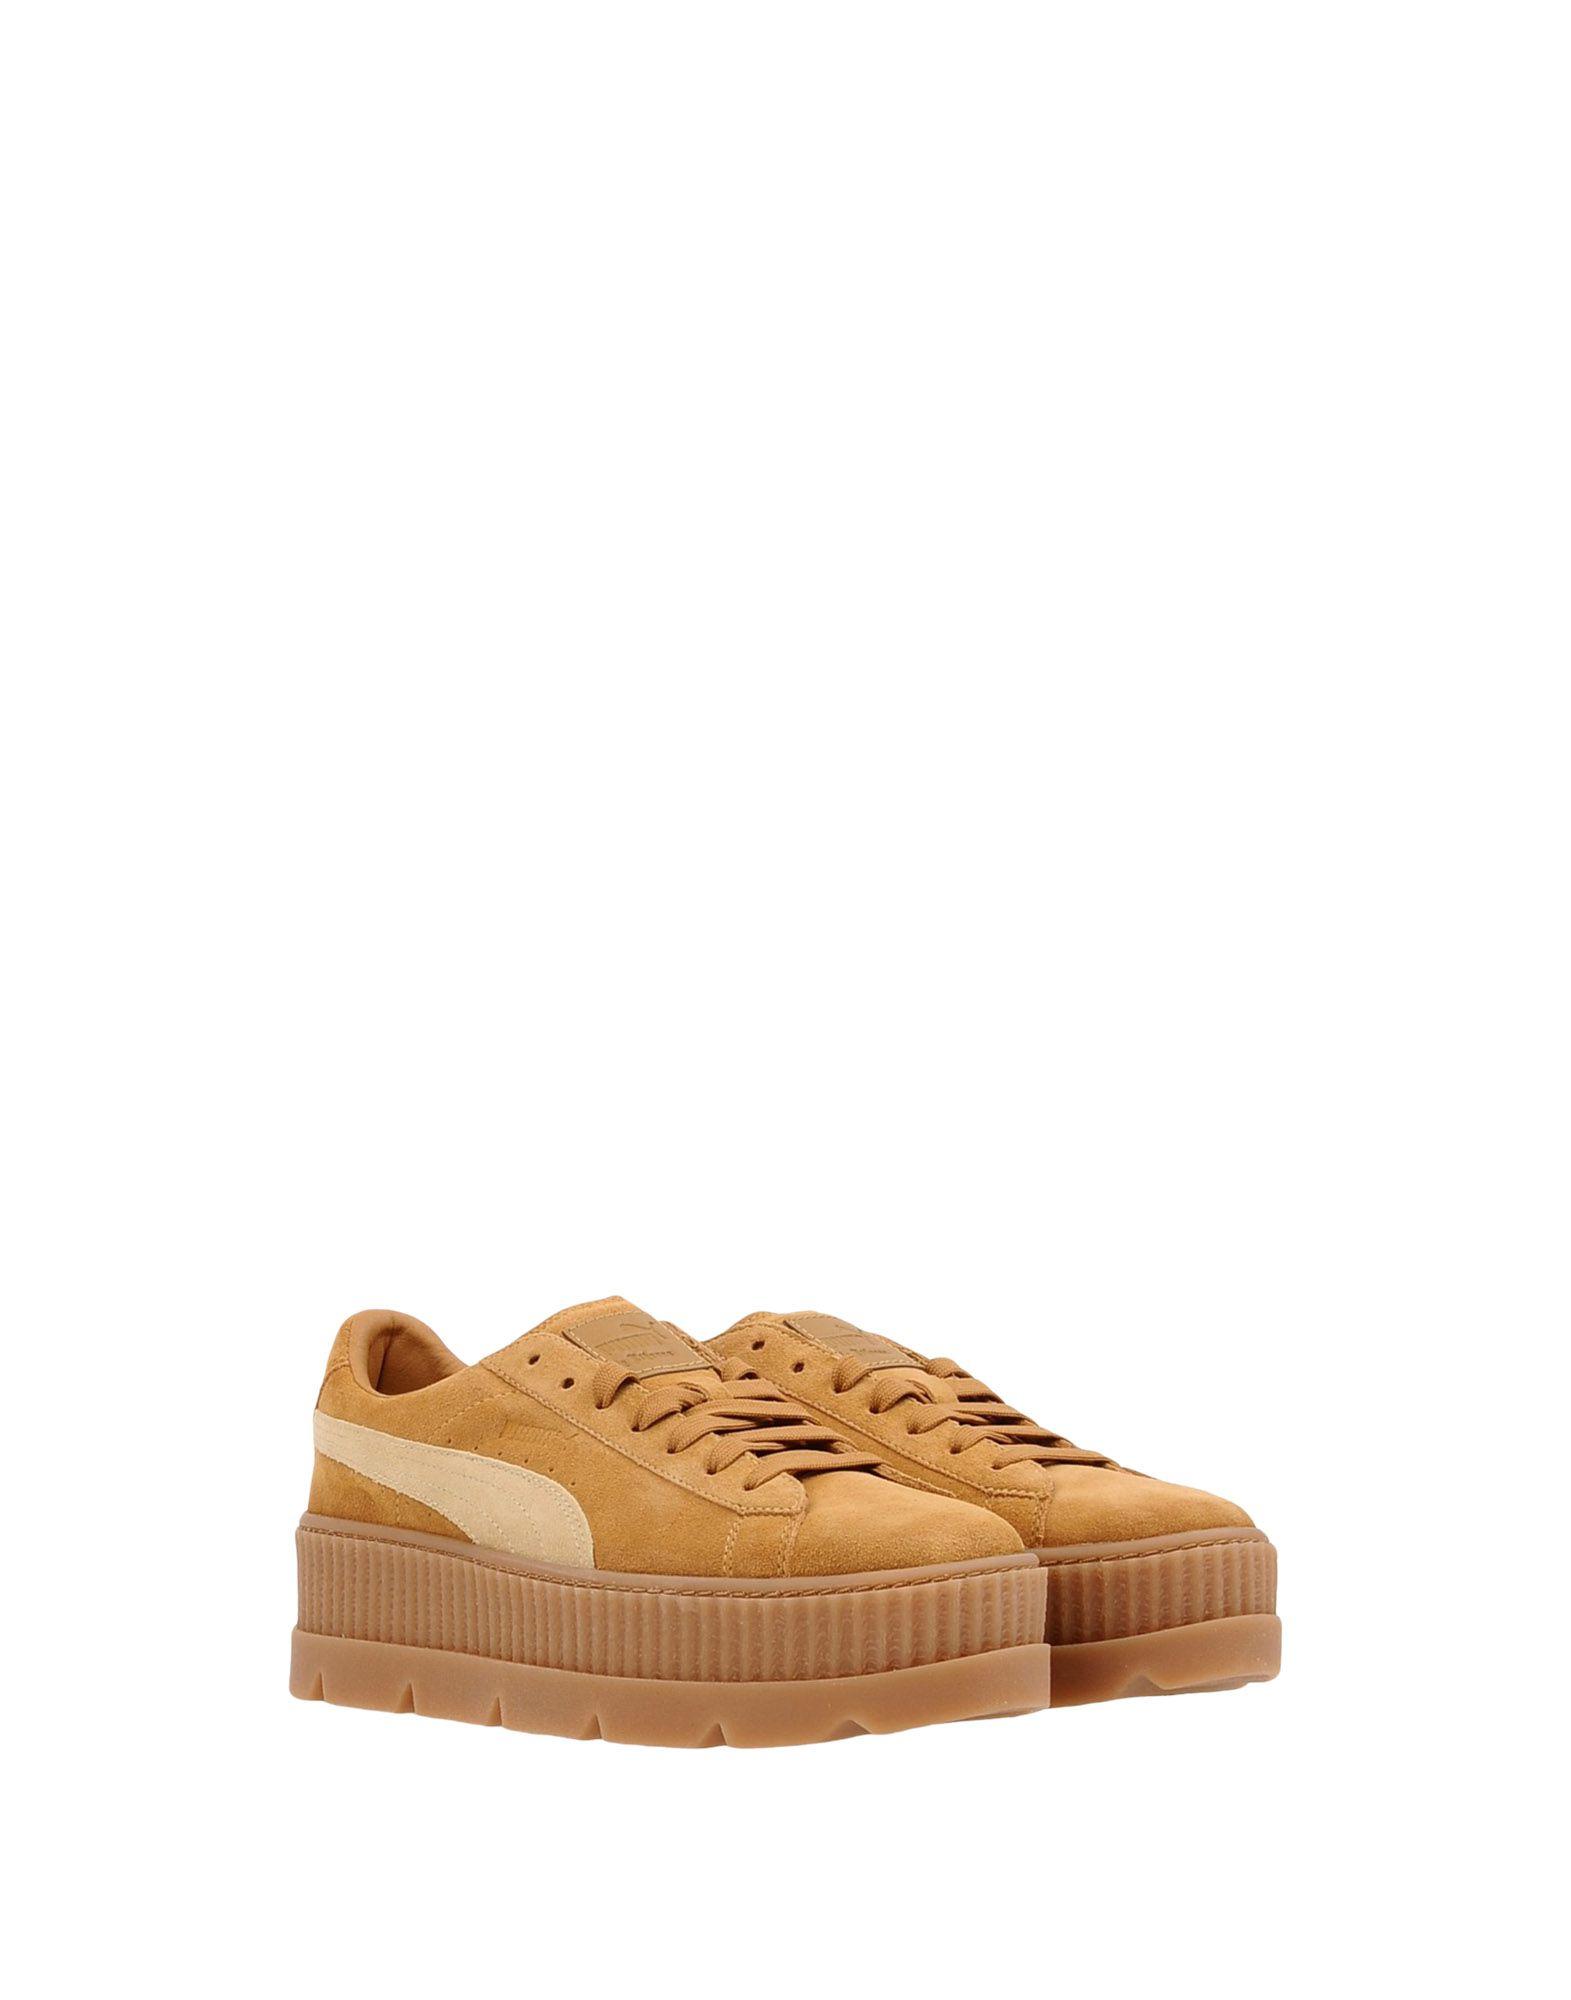 Sneakers Fenty Puma By Rihanna Cleated Creeper Suede - Homme - Sneakers Fenty Puma By Rihanna sur